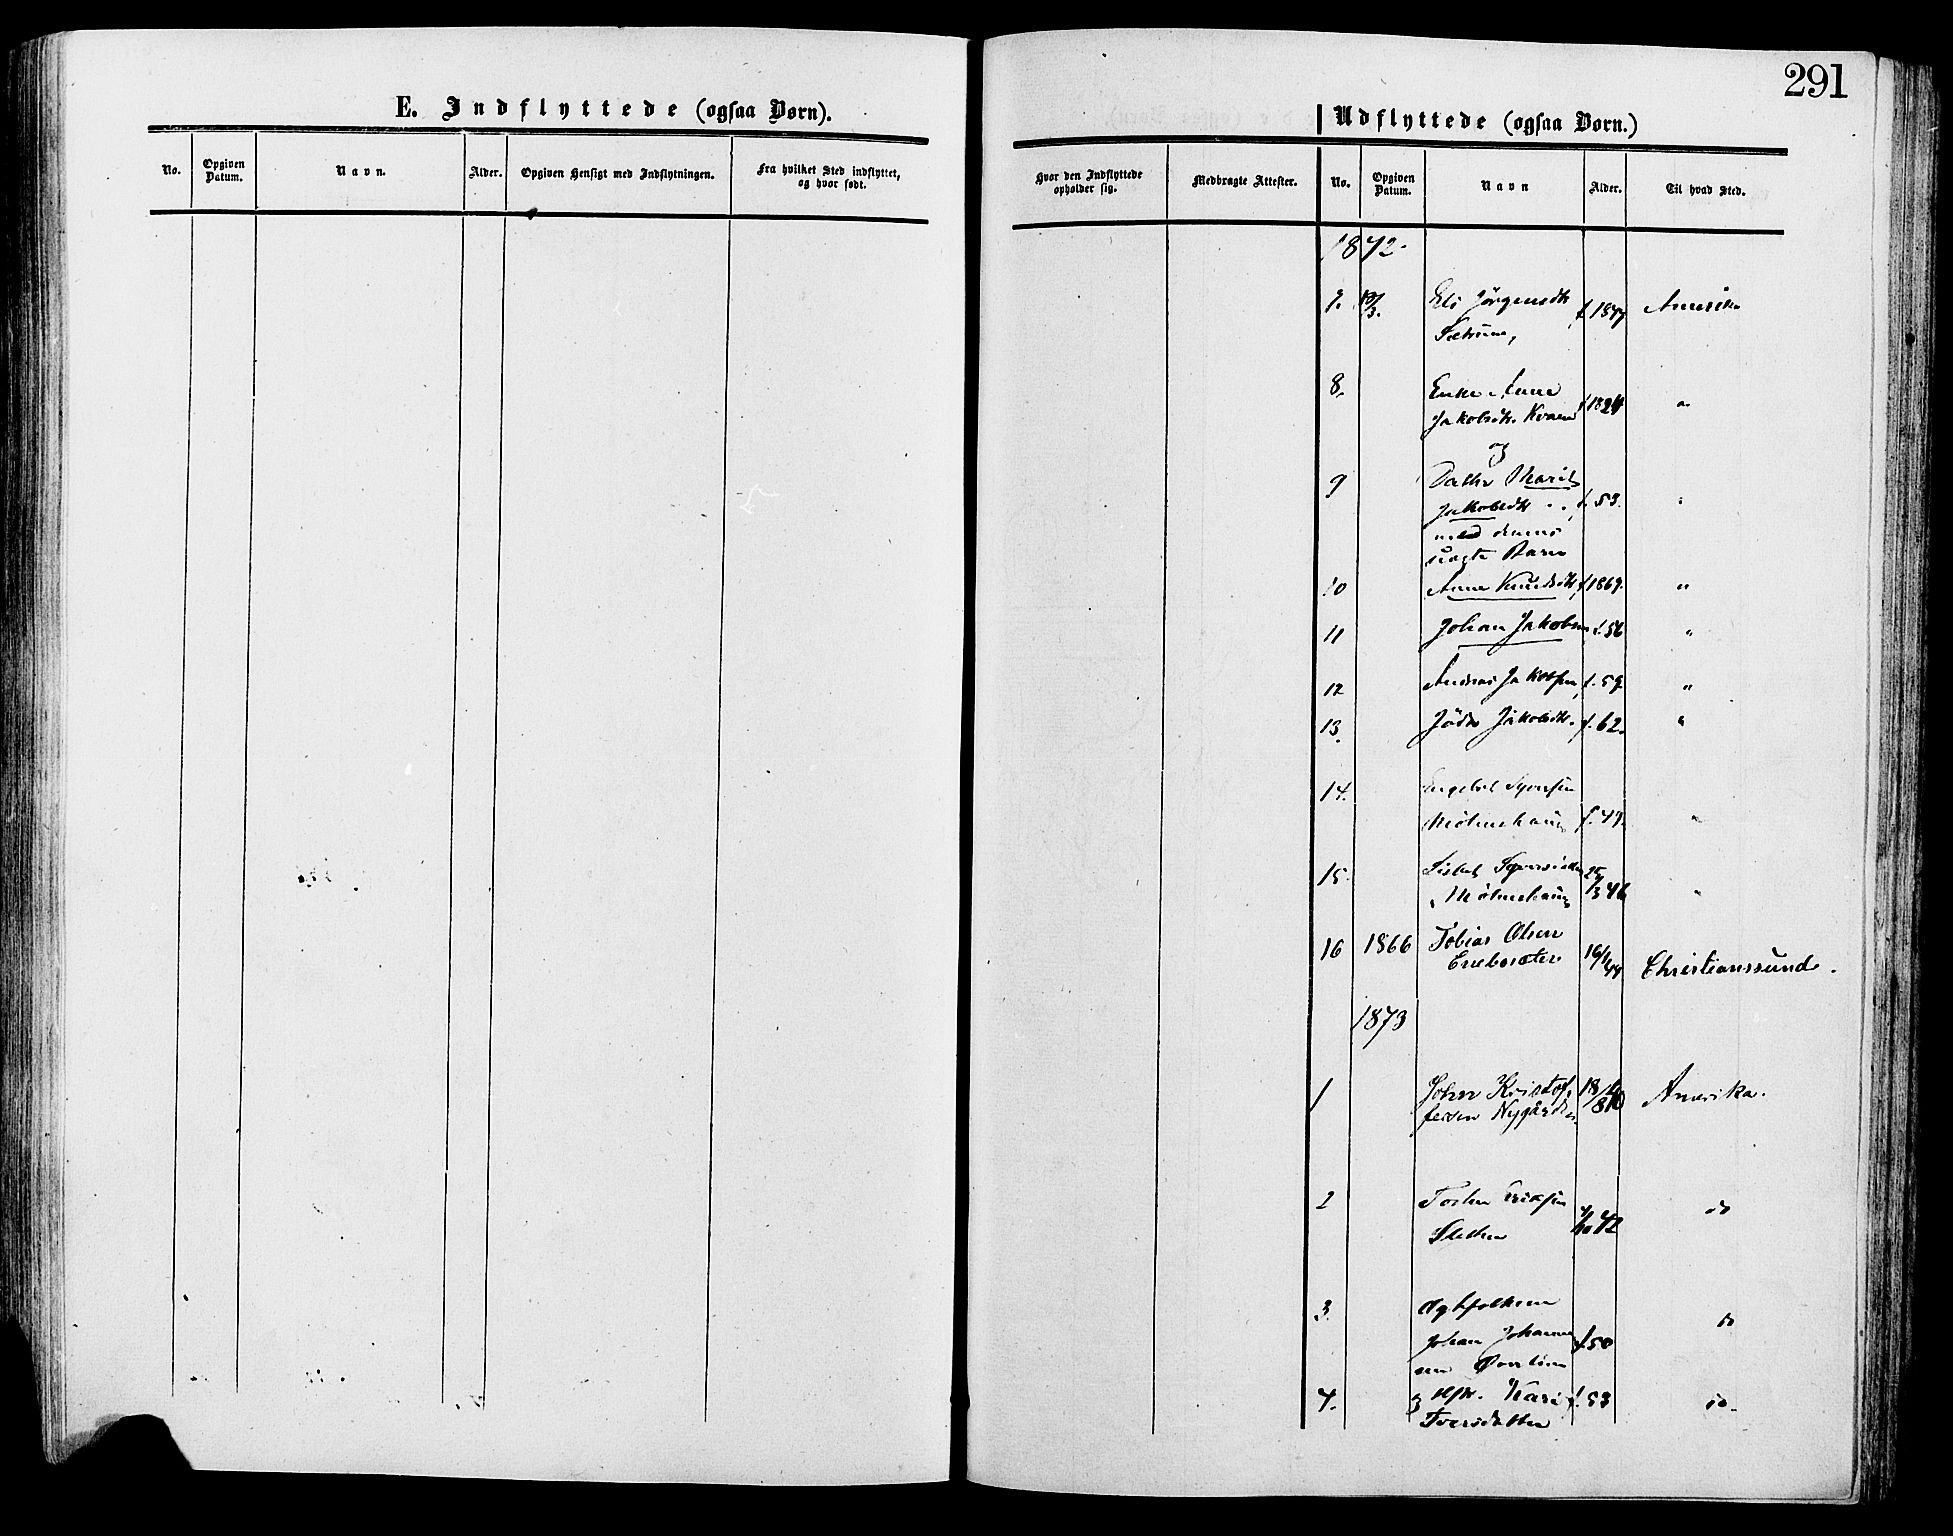 SAH, Lesja prestekontor, Ministerialbok nr. 9, 1854-1889, s. 291